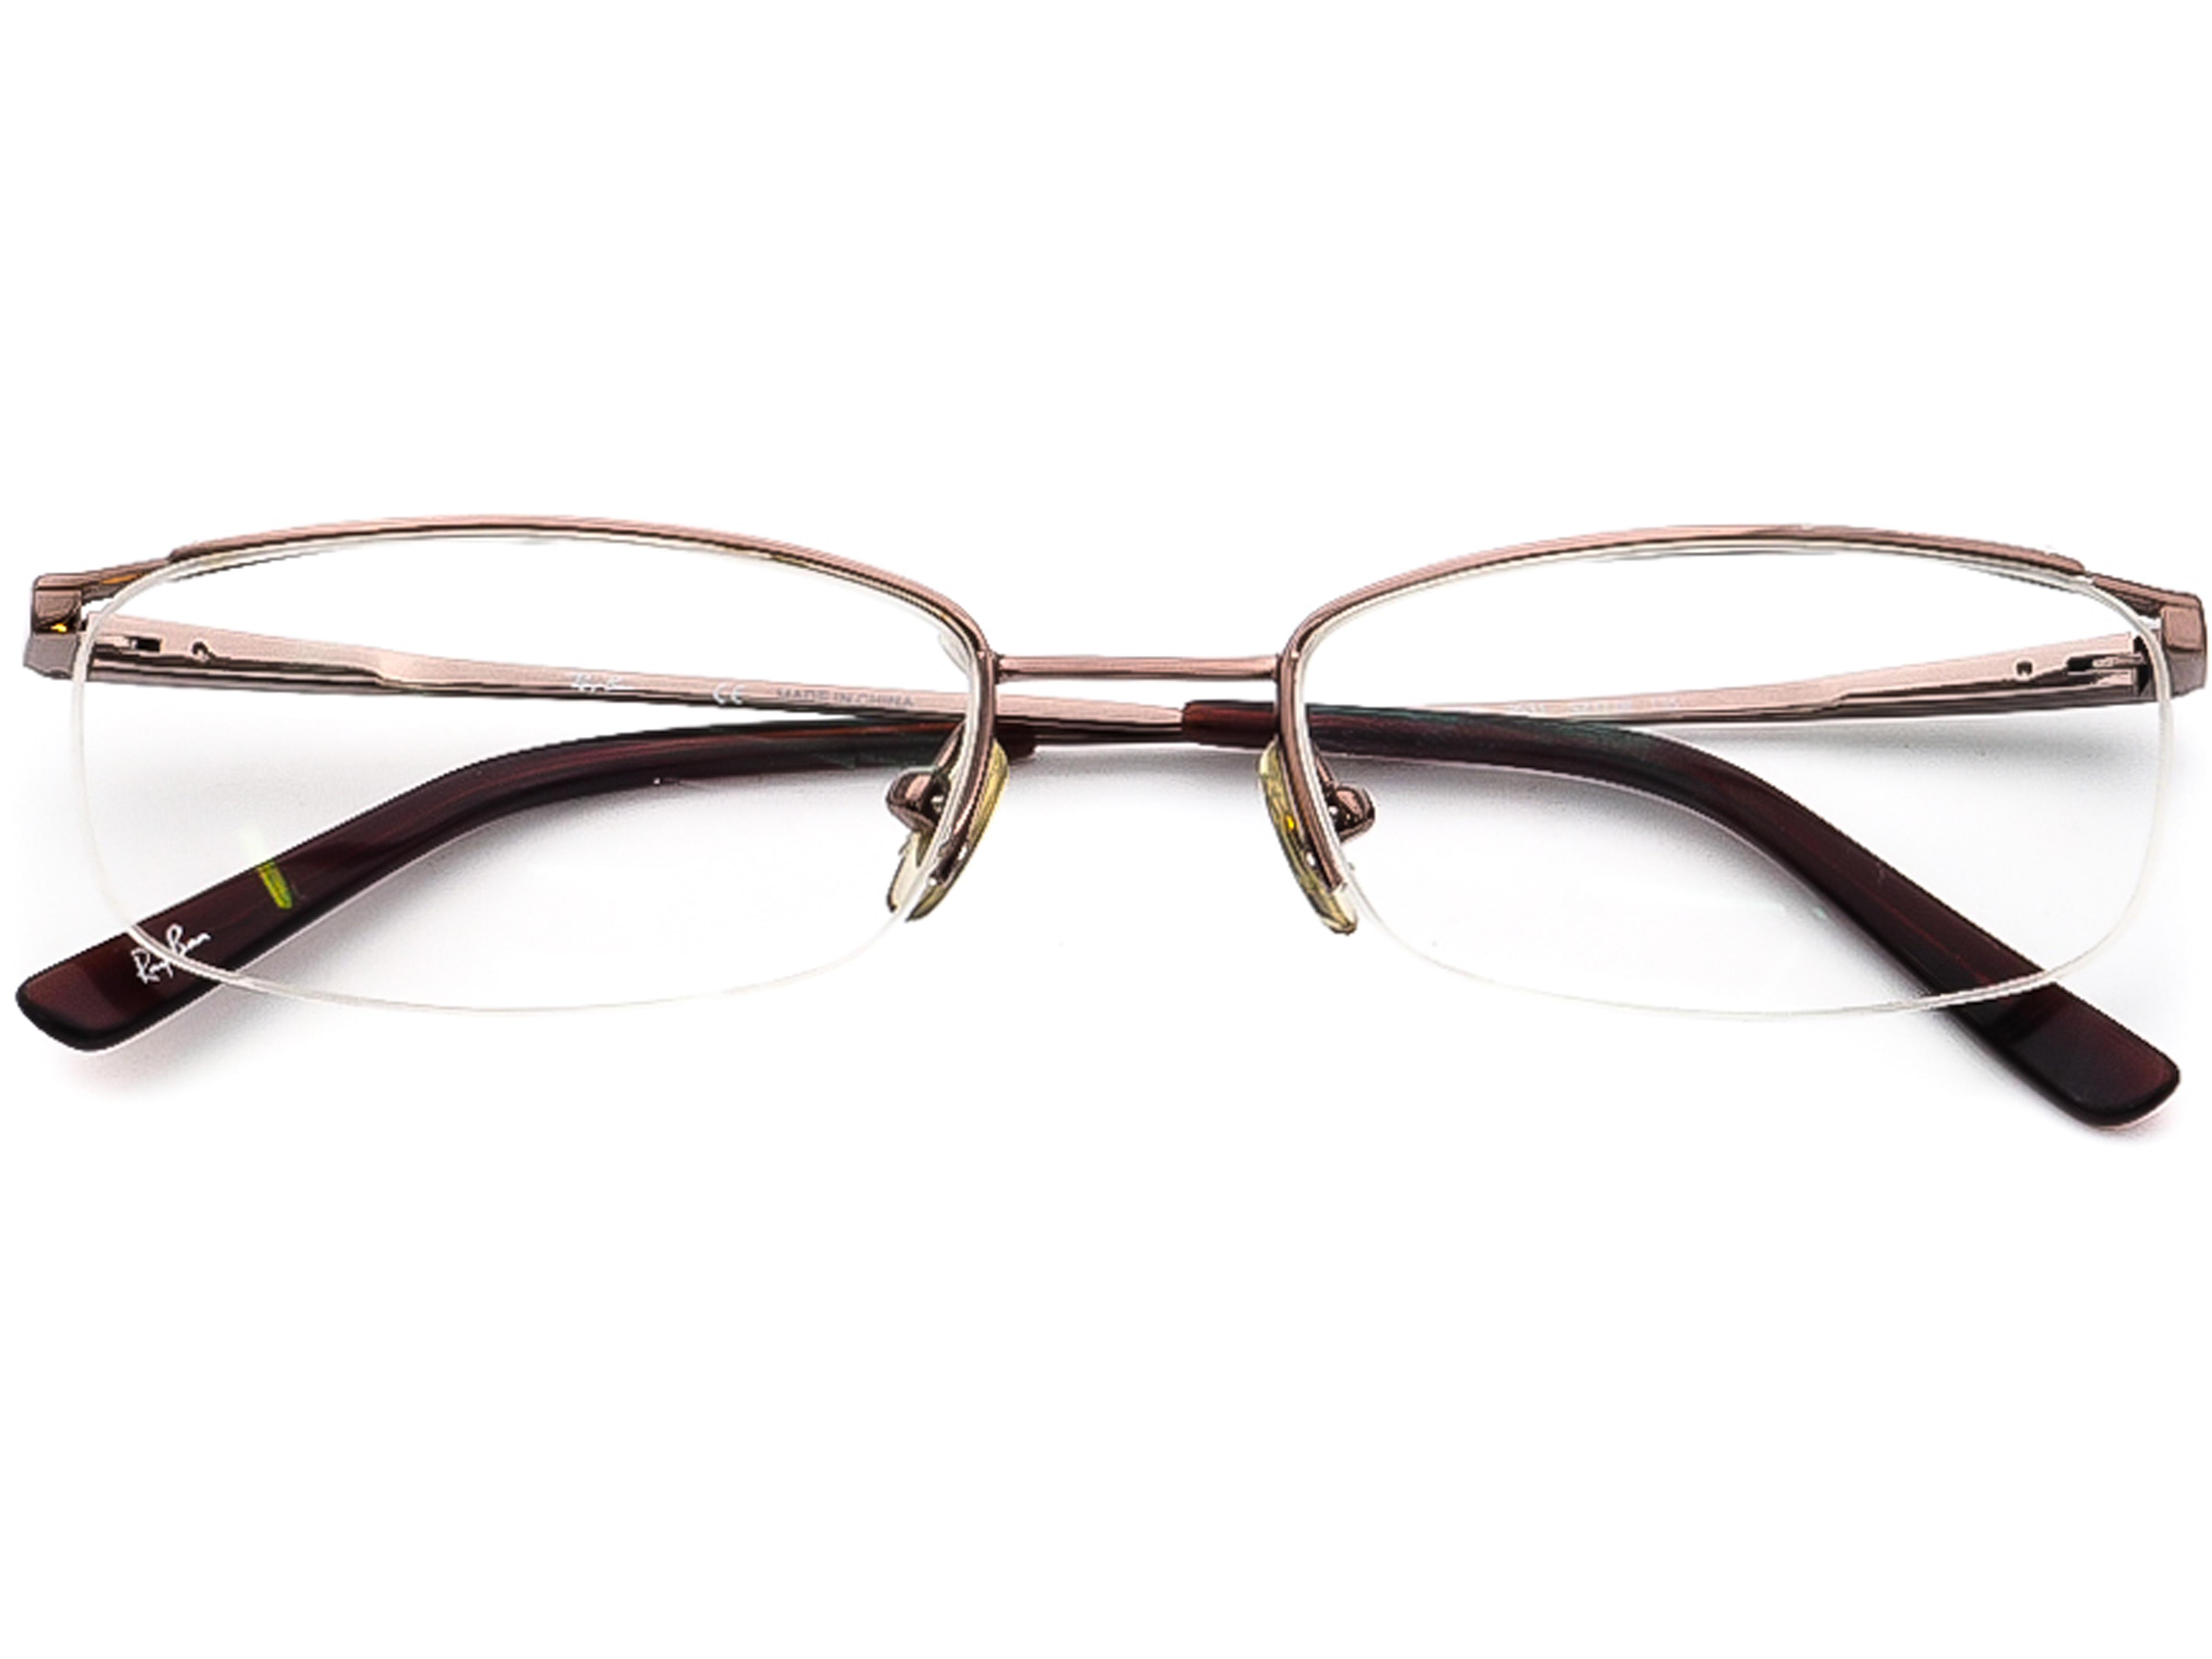 Ray-Ban Eyeglasses Frames RX6489 2531 58MM Light Brown